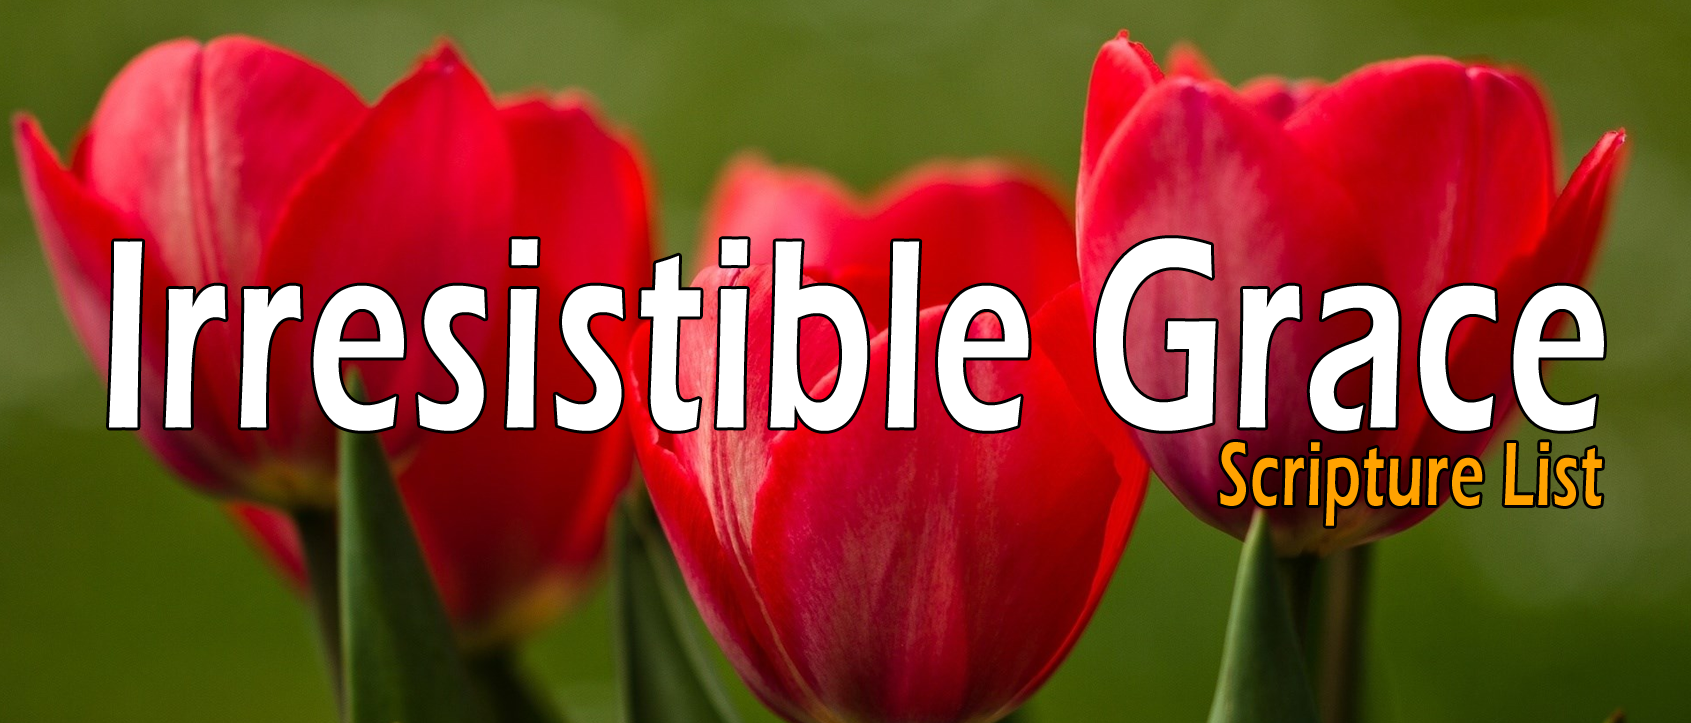 Irresistible Grace,  Effectual Calling - Scripture List